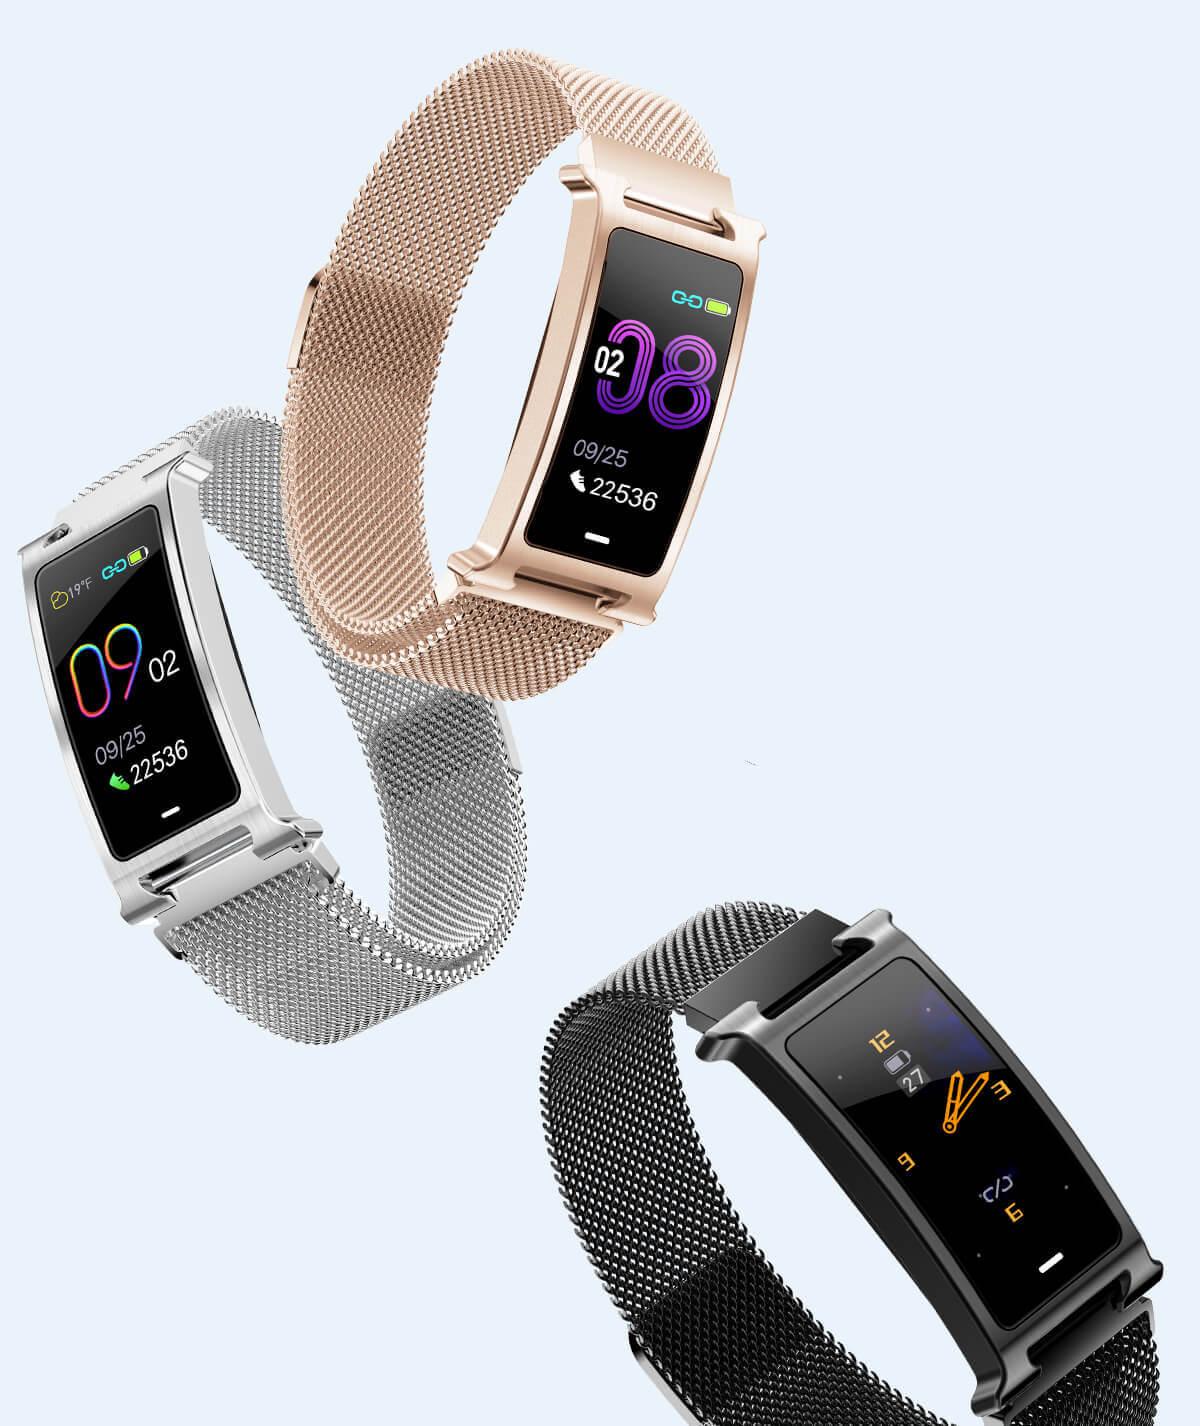 Chytrý kovový fitness náramek Smartomat Silentband 2 chytré hodinky 7